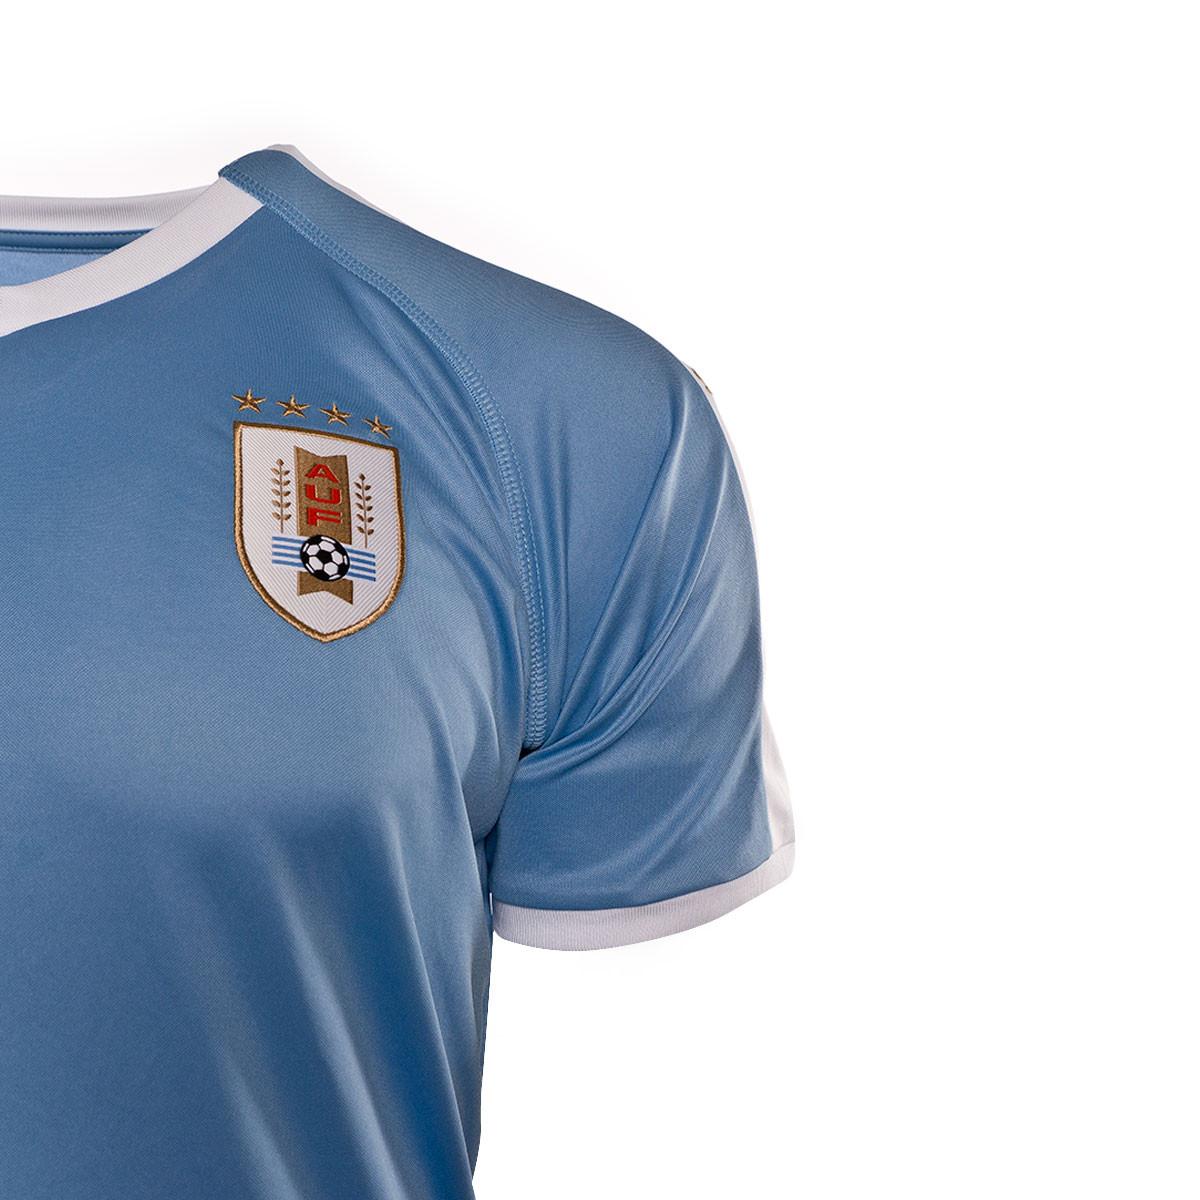 Camisa Puma Uruguai Home 2019